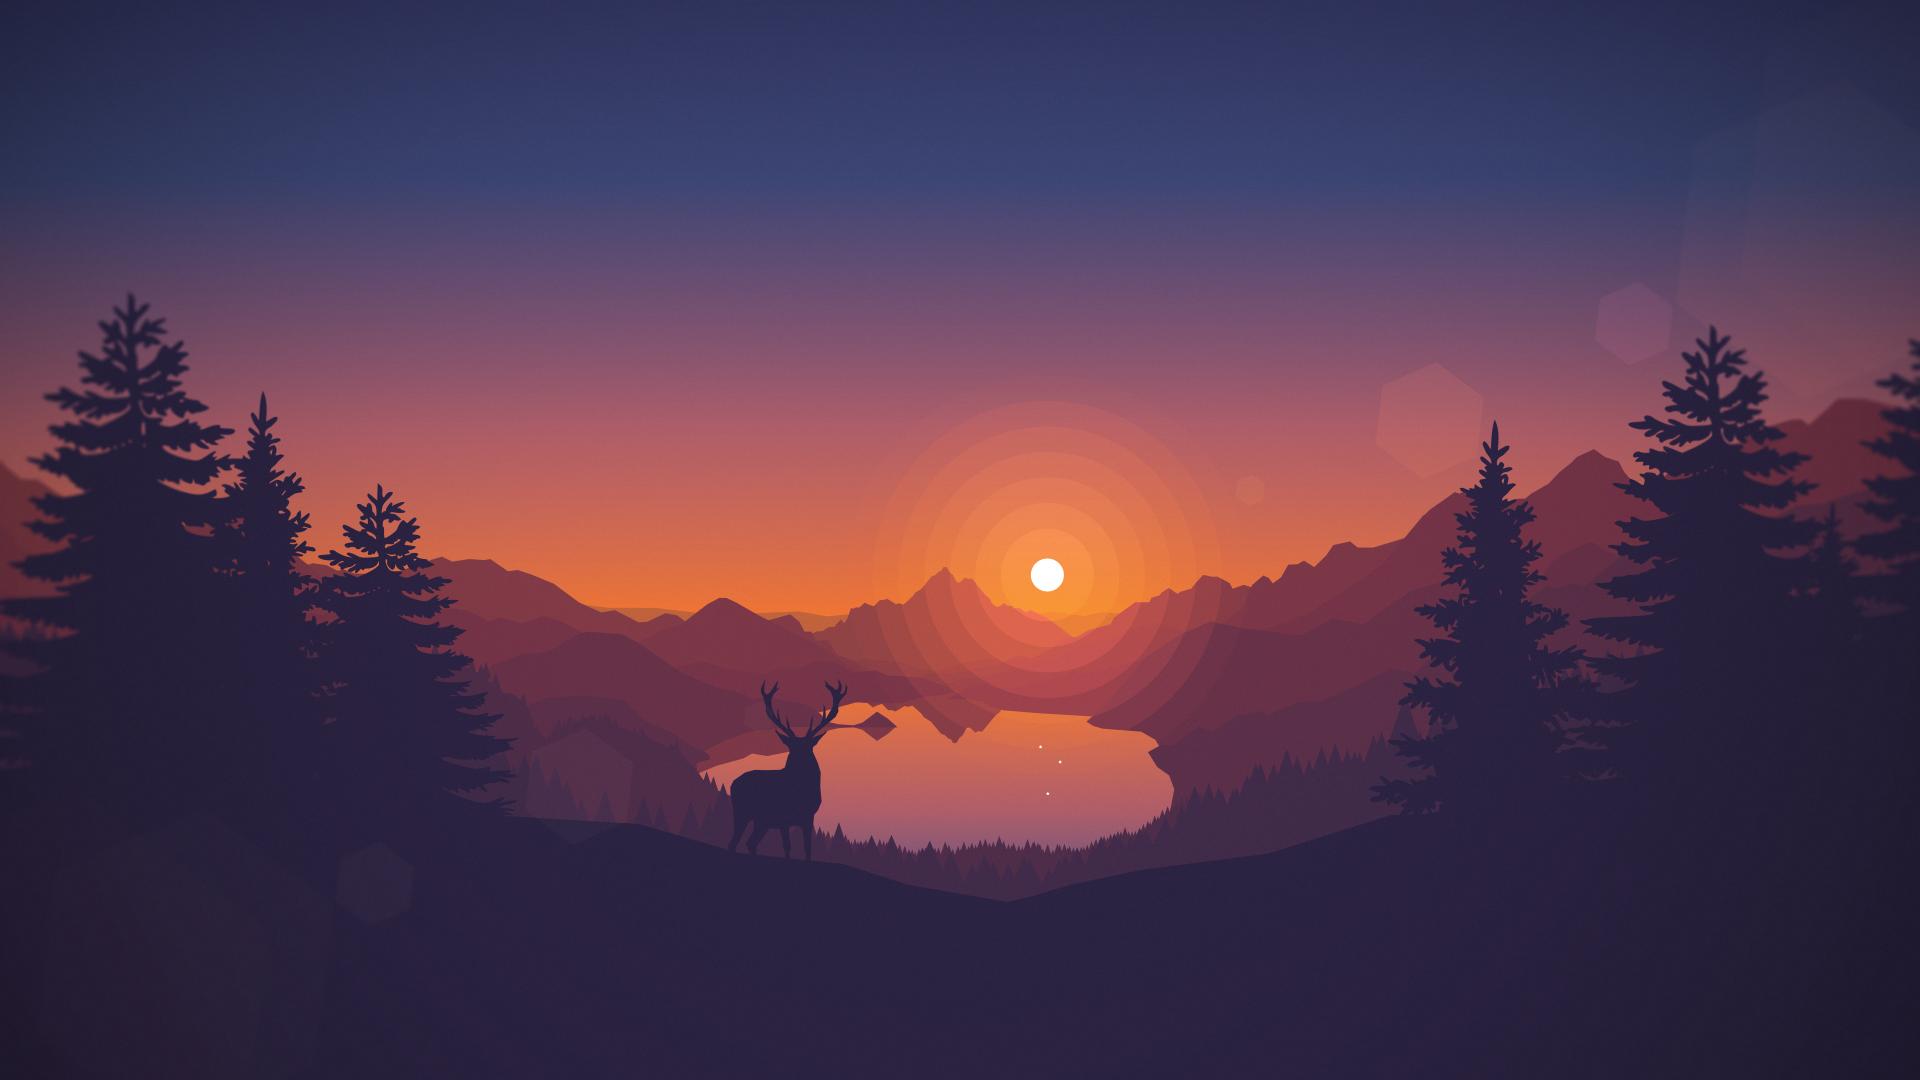 dribbble - lakeside_sunset_1920x1080louis coyle